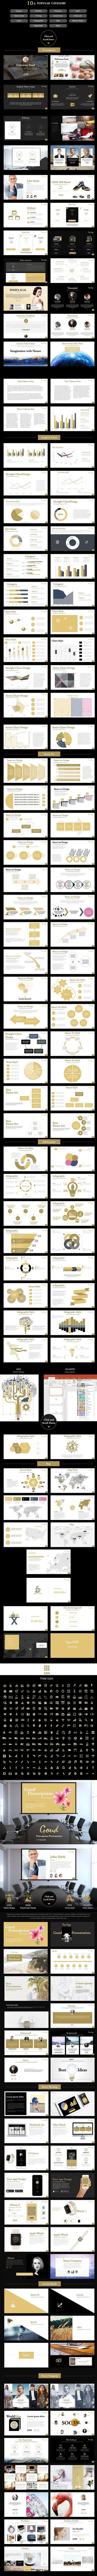 Goud PowerPoint Presentation . UI Elements. $14.00